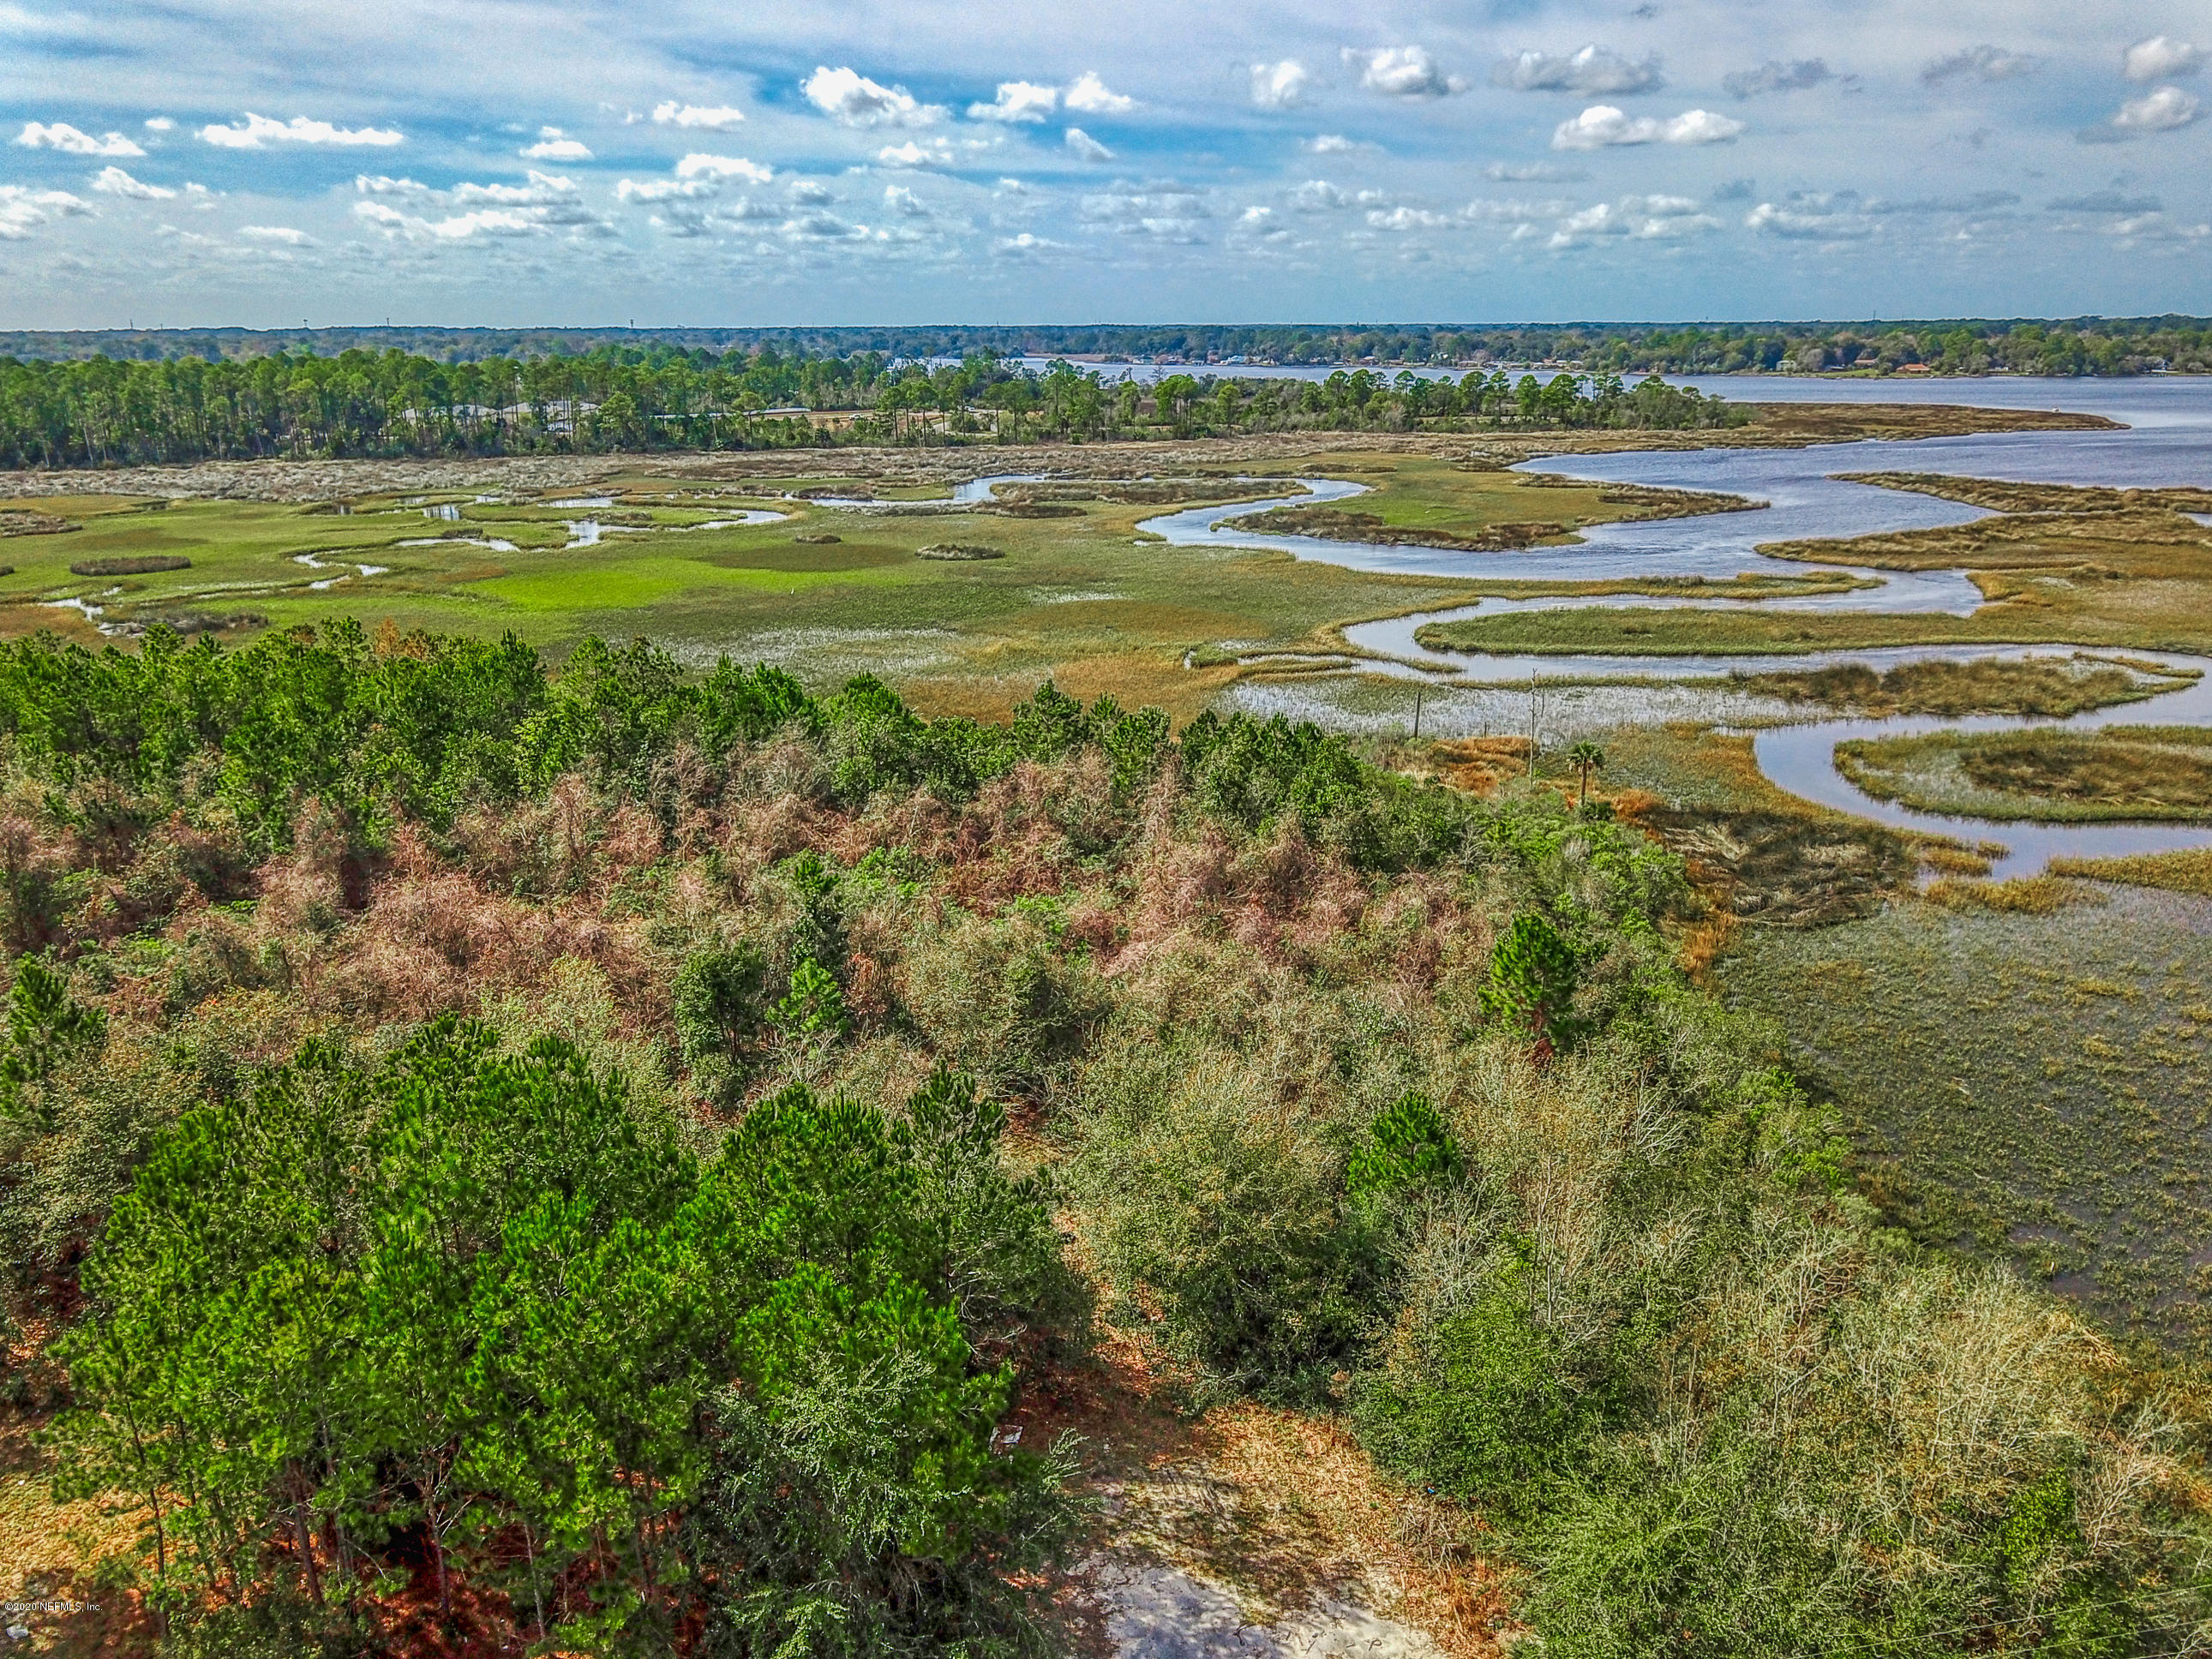 0 BROWARD, JACKSONVILLE, FLORIDA 32218, ,Vacant land,For sale,BROWARD,1038051